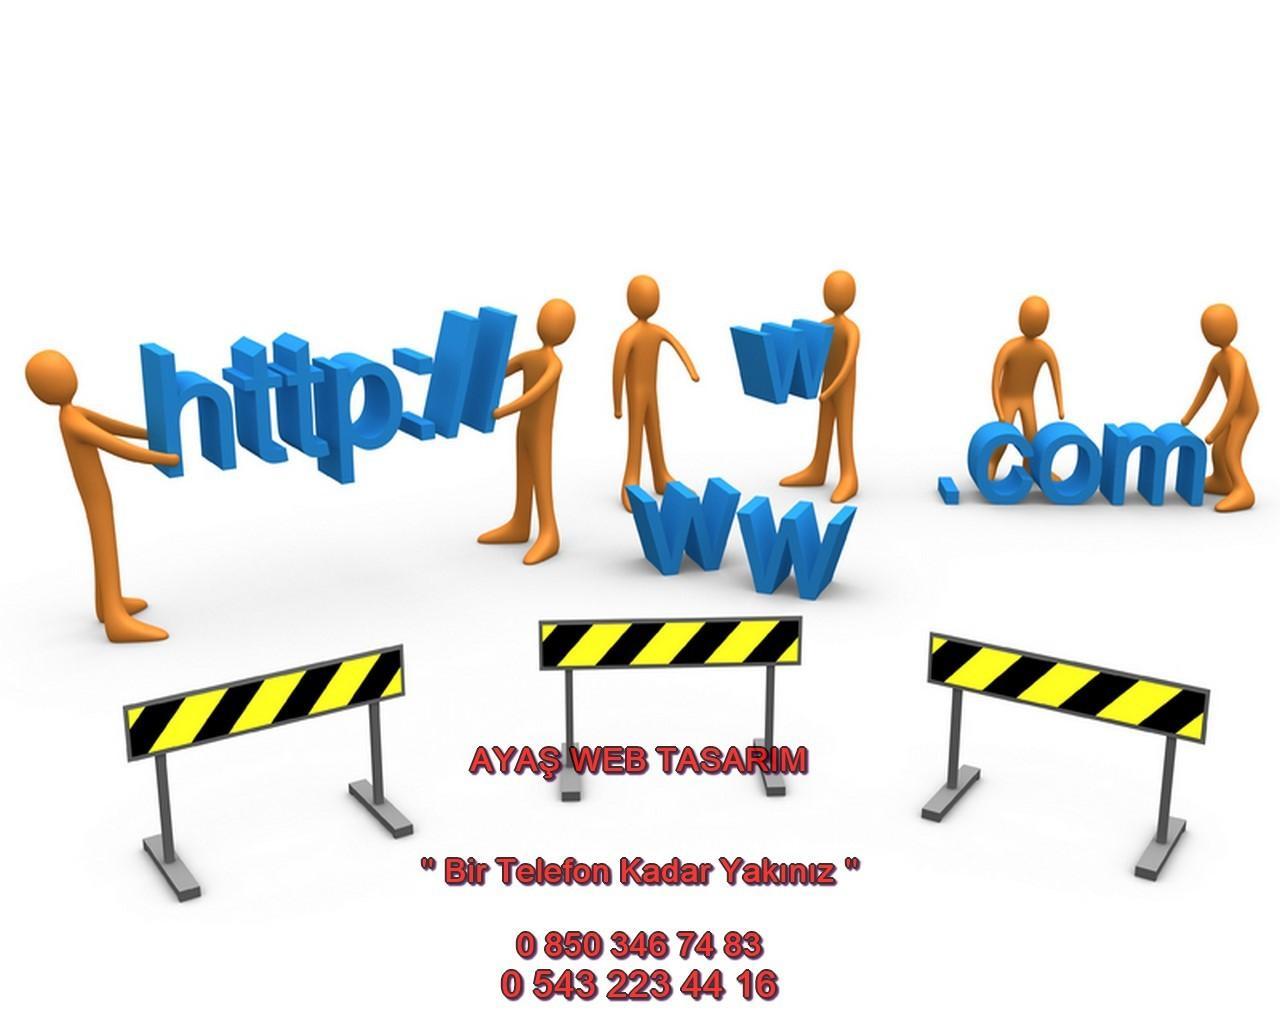 Ayas Web Tasarım